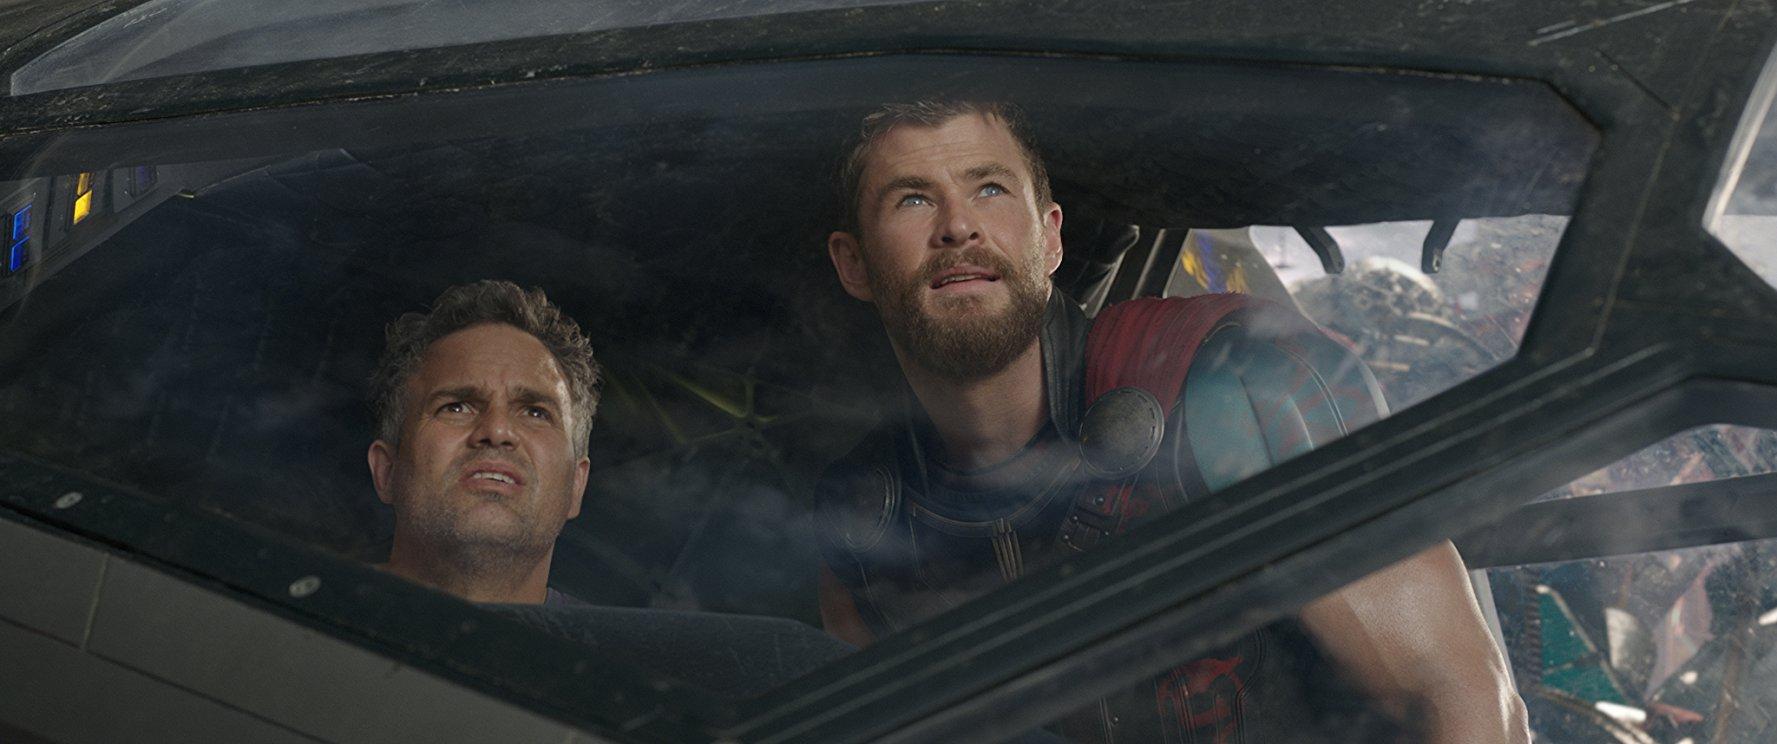 Thor-Ragnarok-Hope-and-Crosby